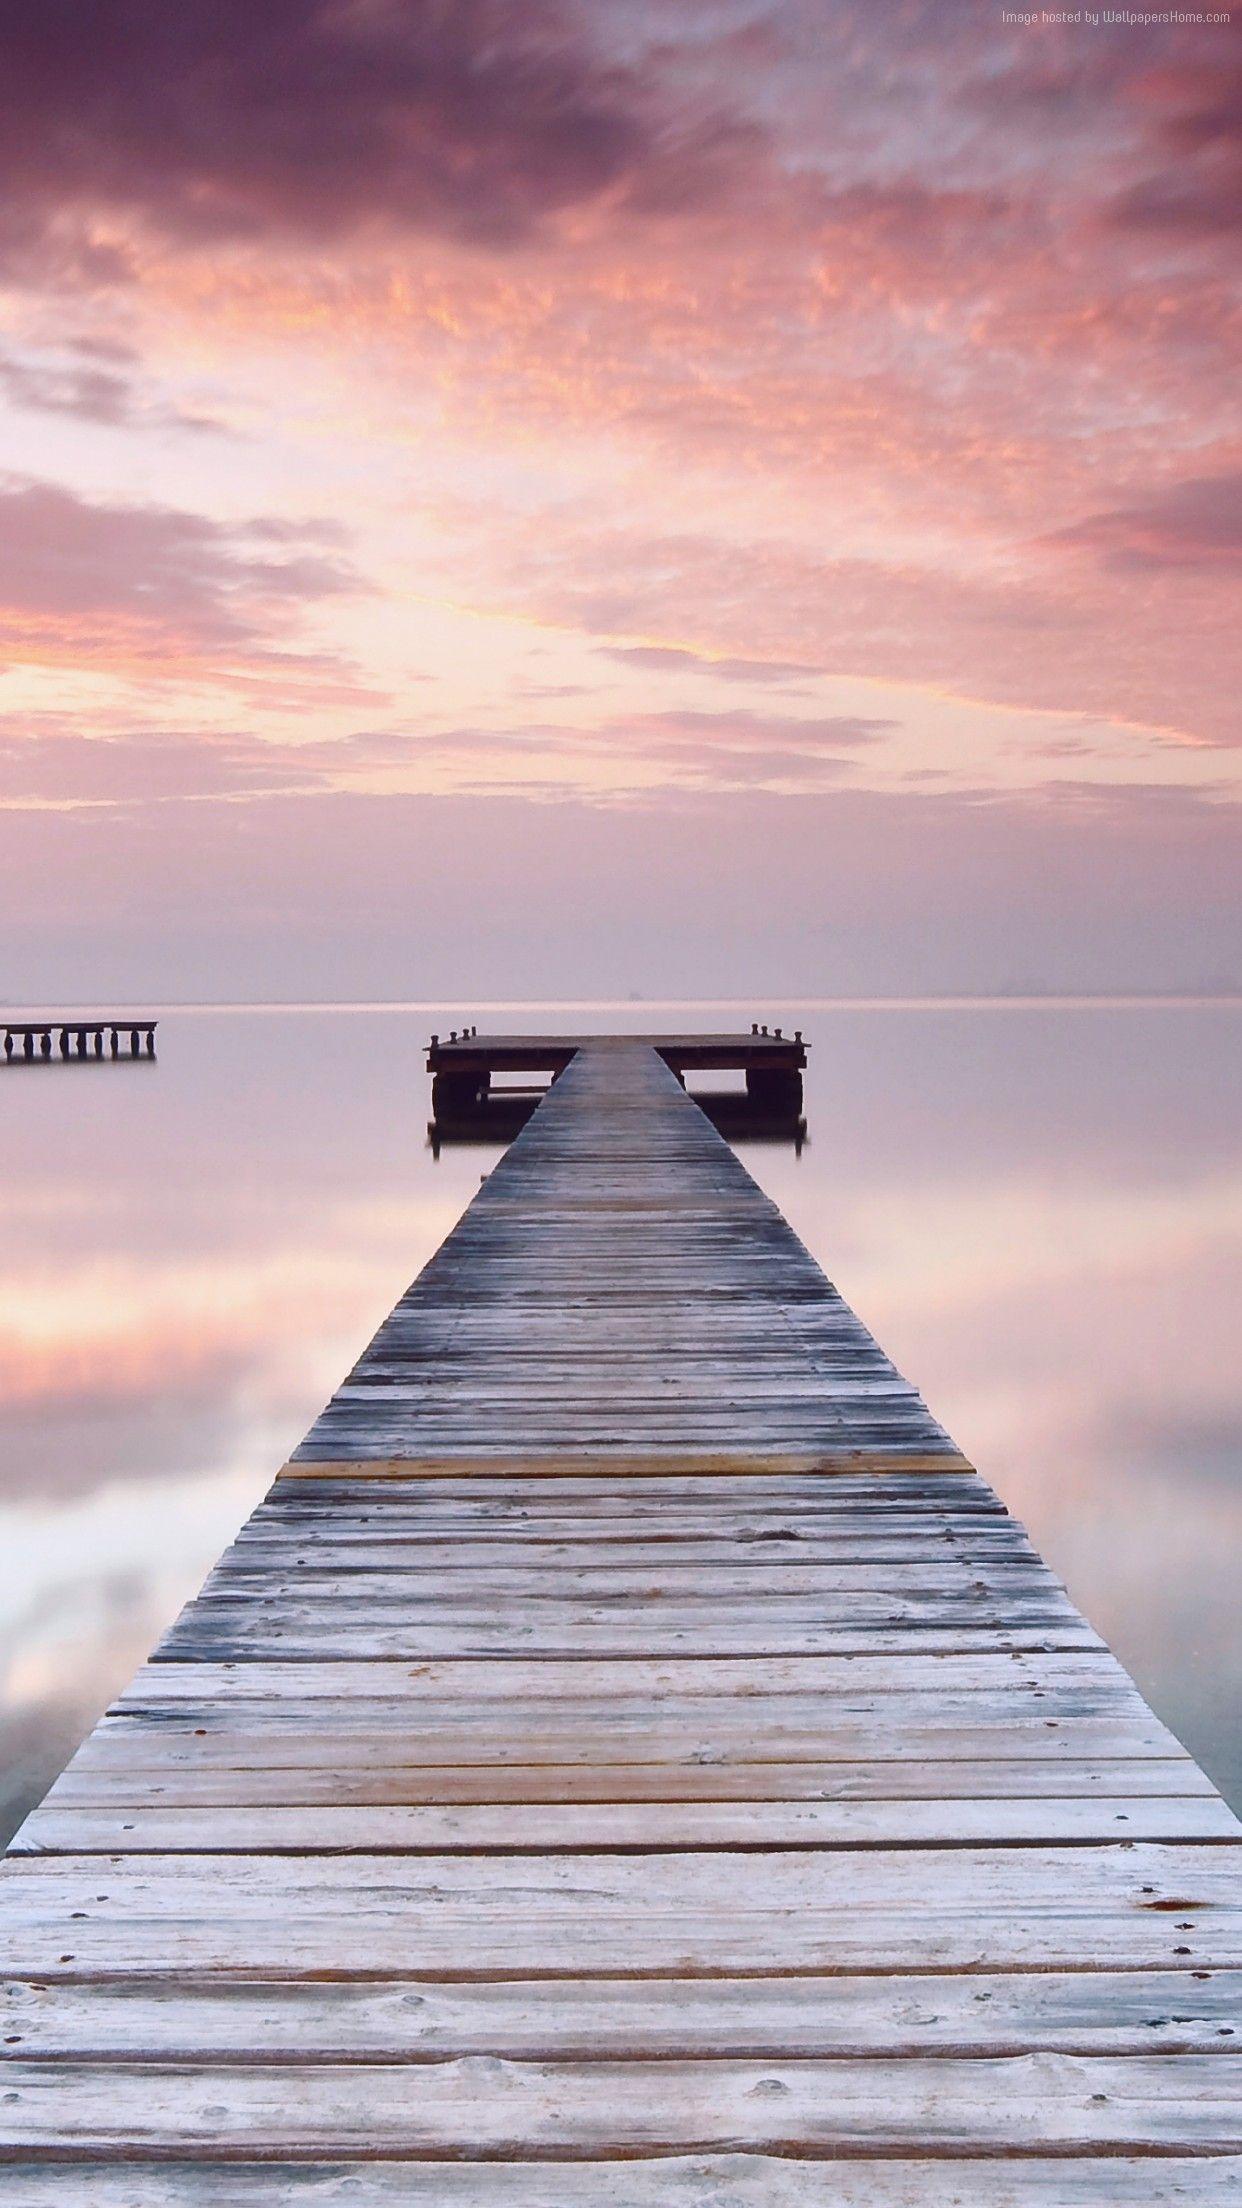 Sky Sunset Water Ocean Jetty Pink Wallpaper Iphone Clean